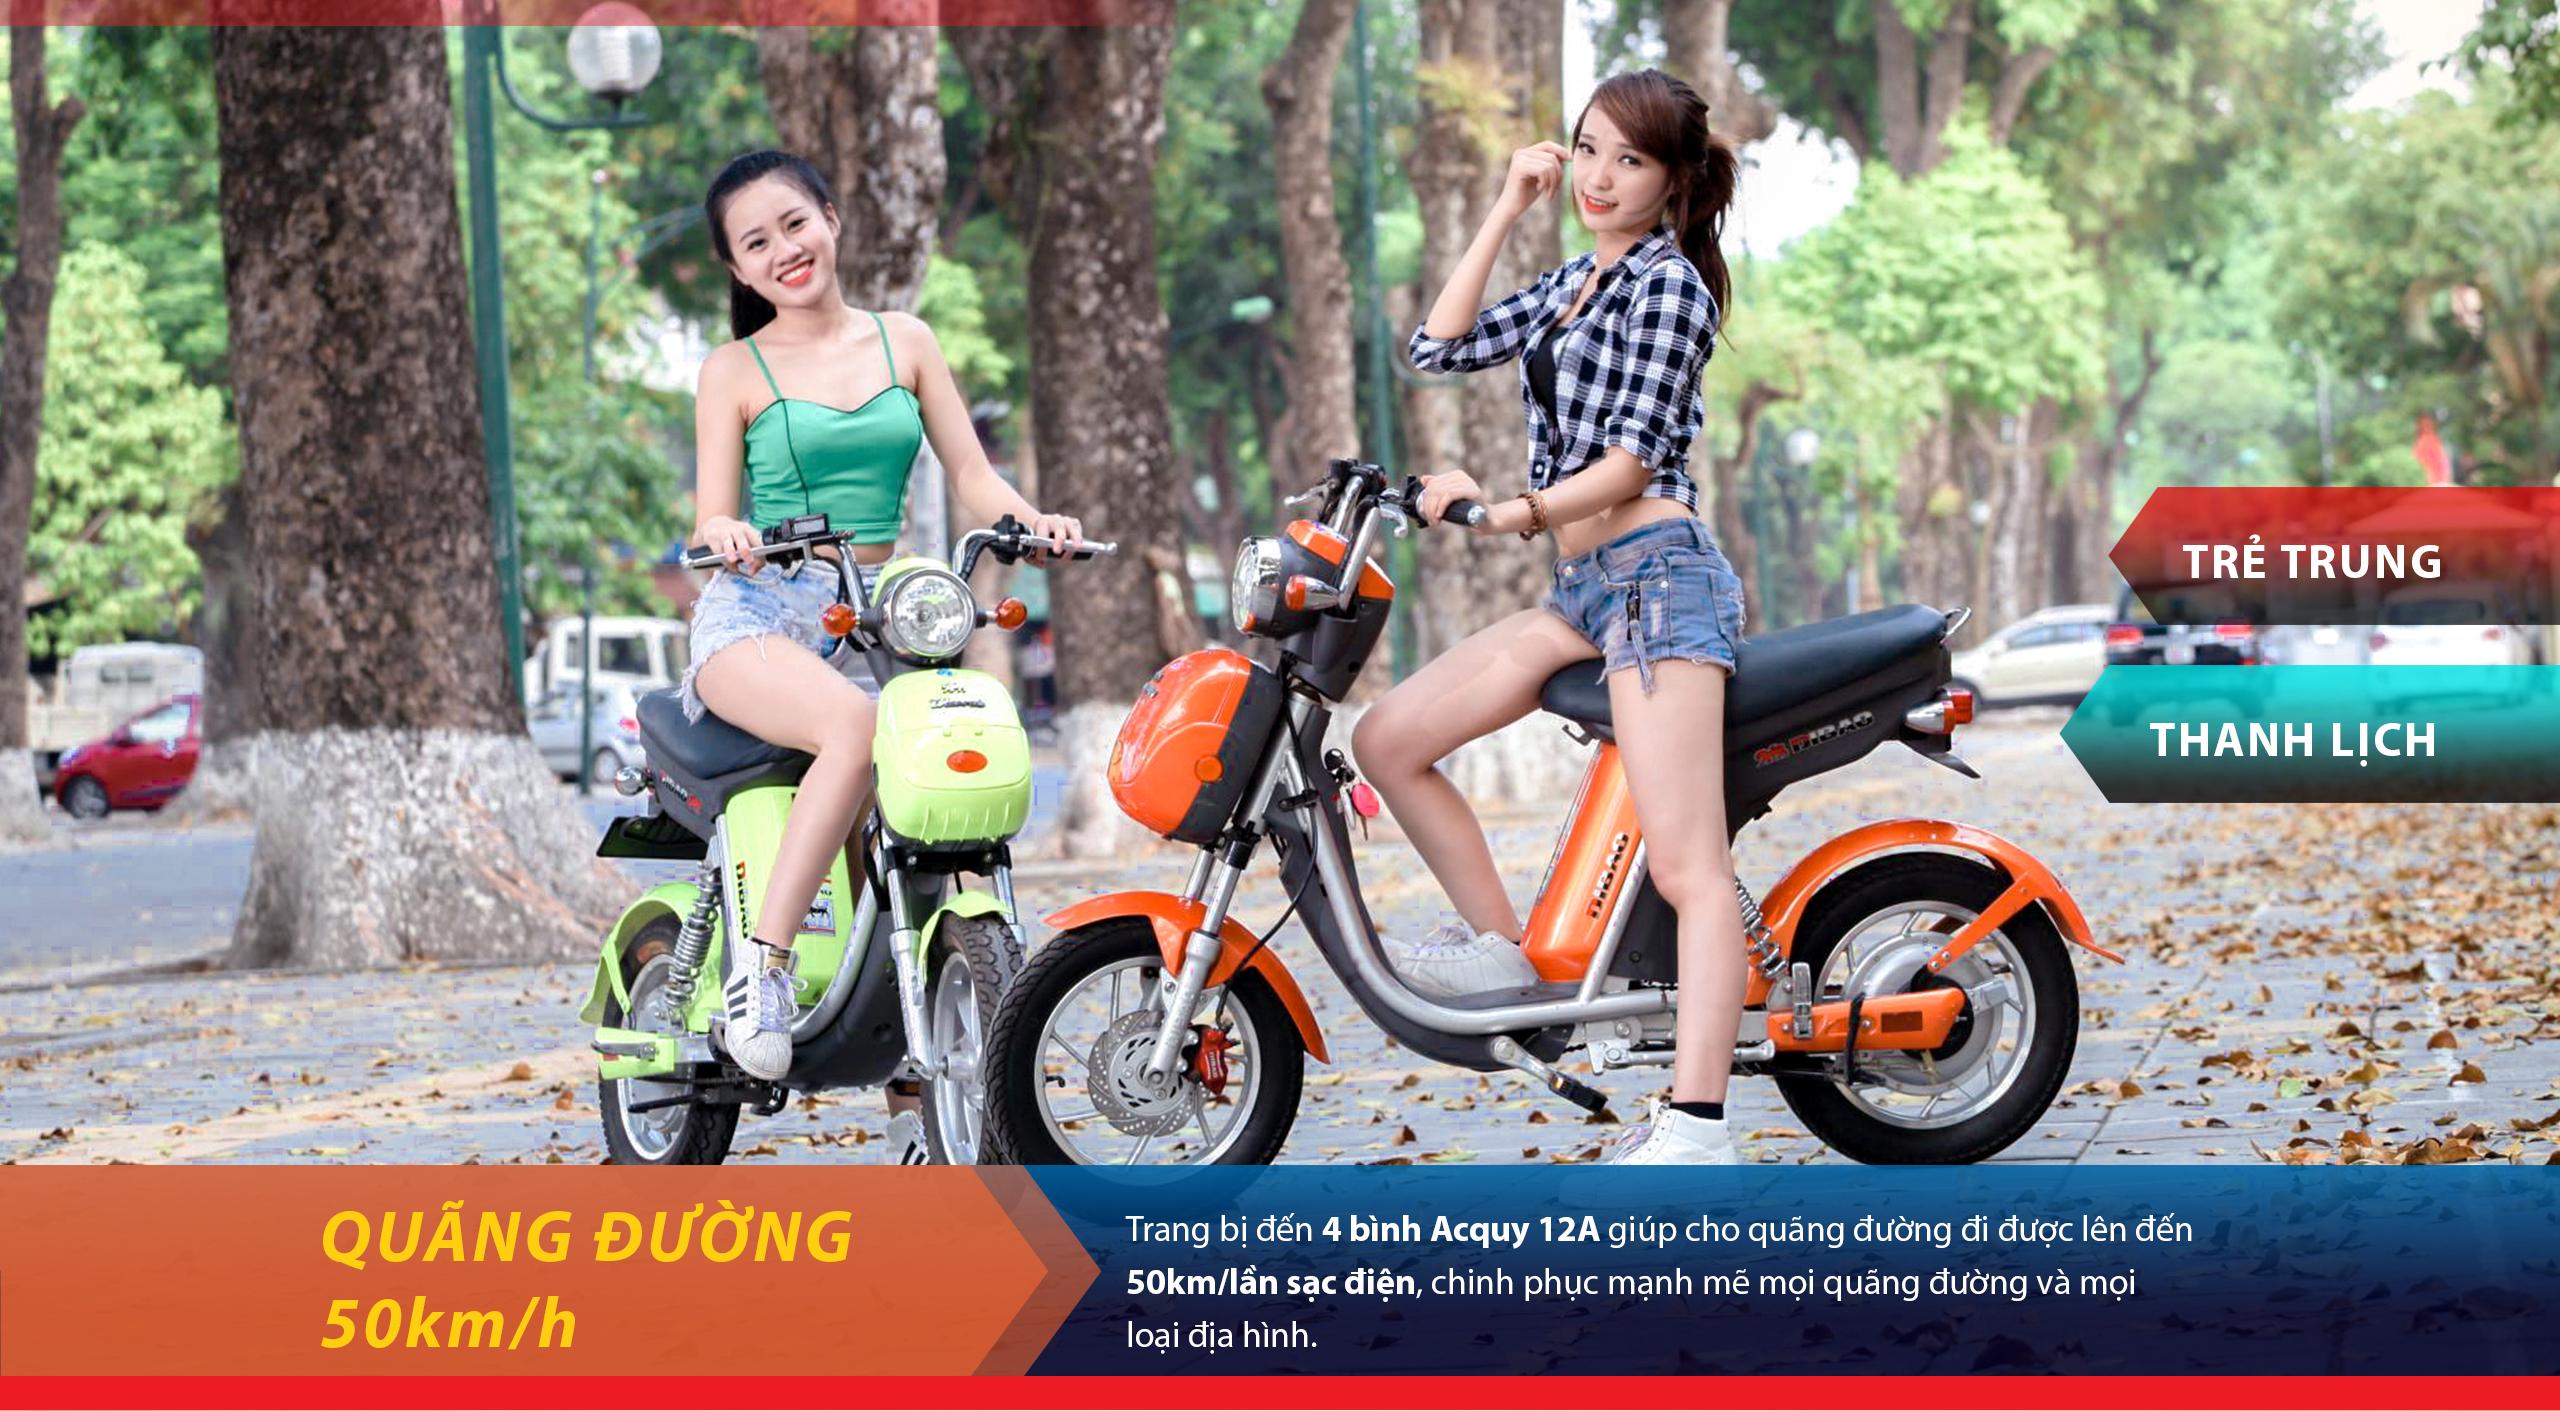 xe đạp điện ninja dibao